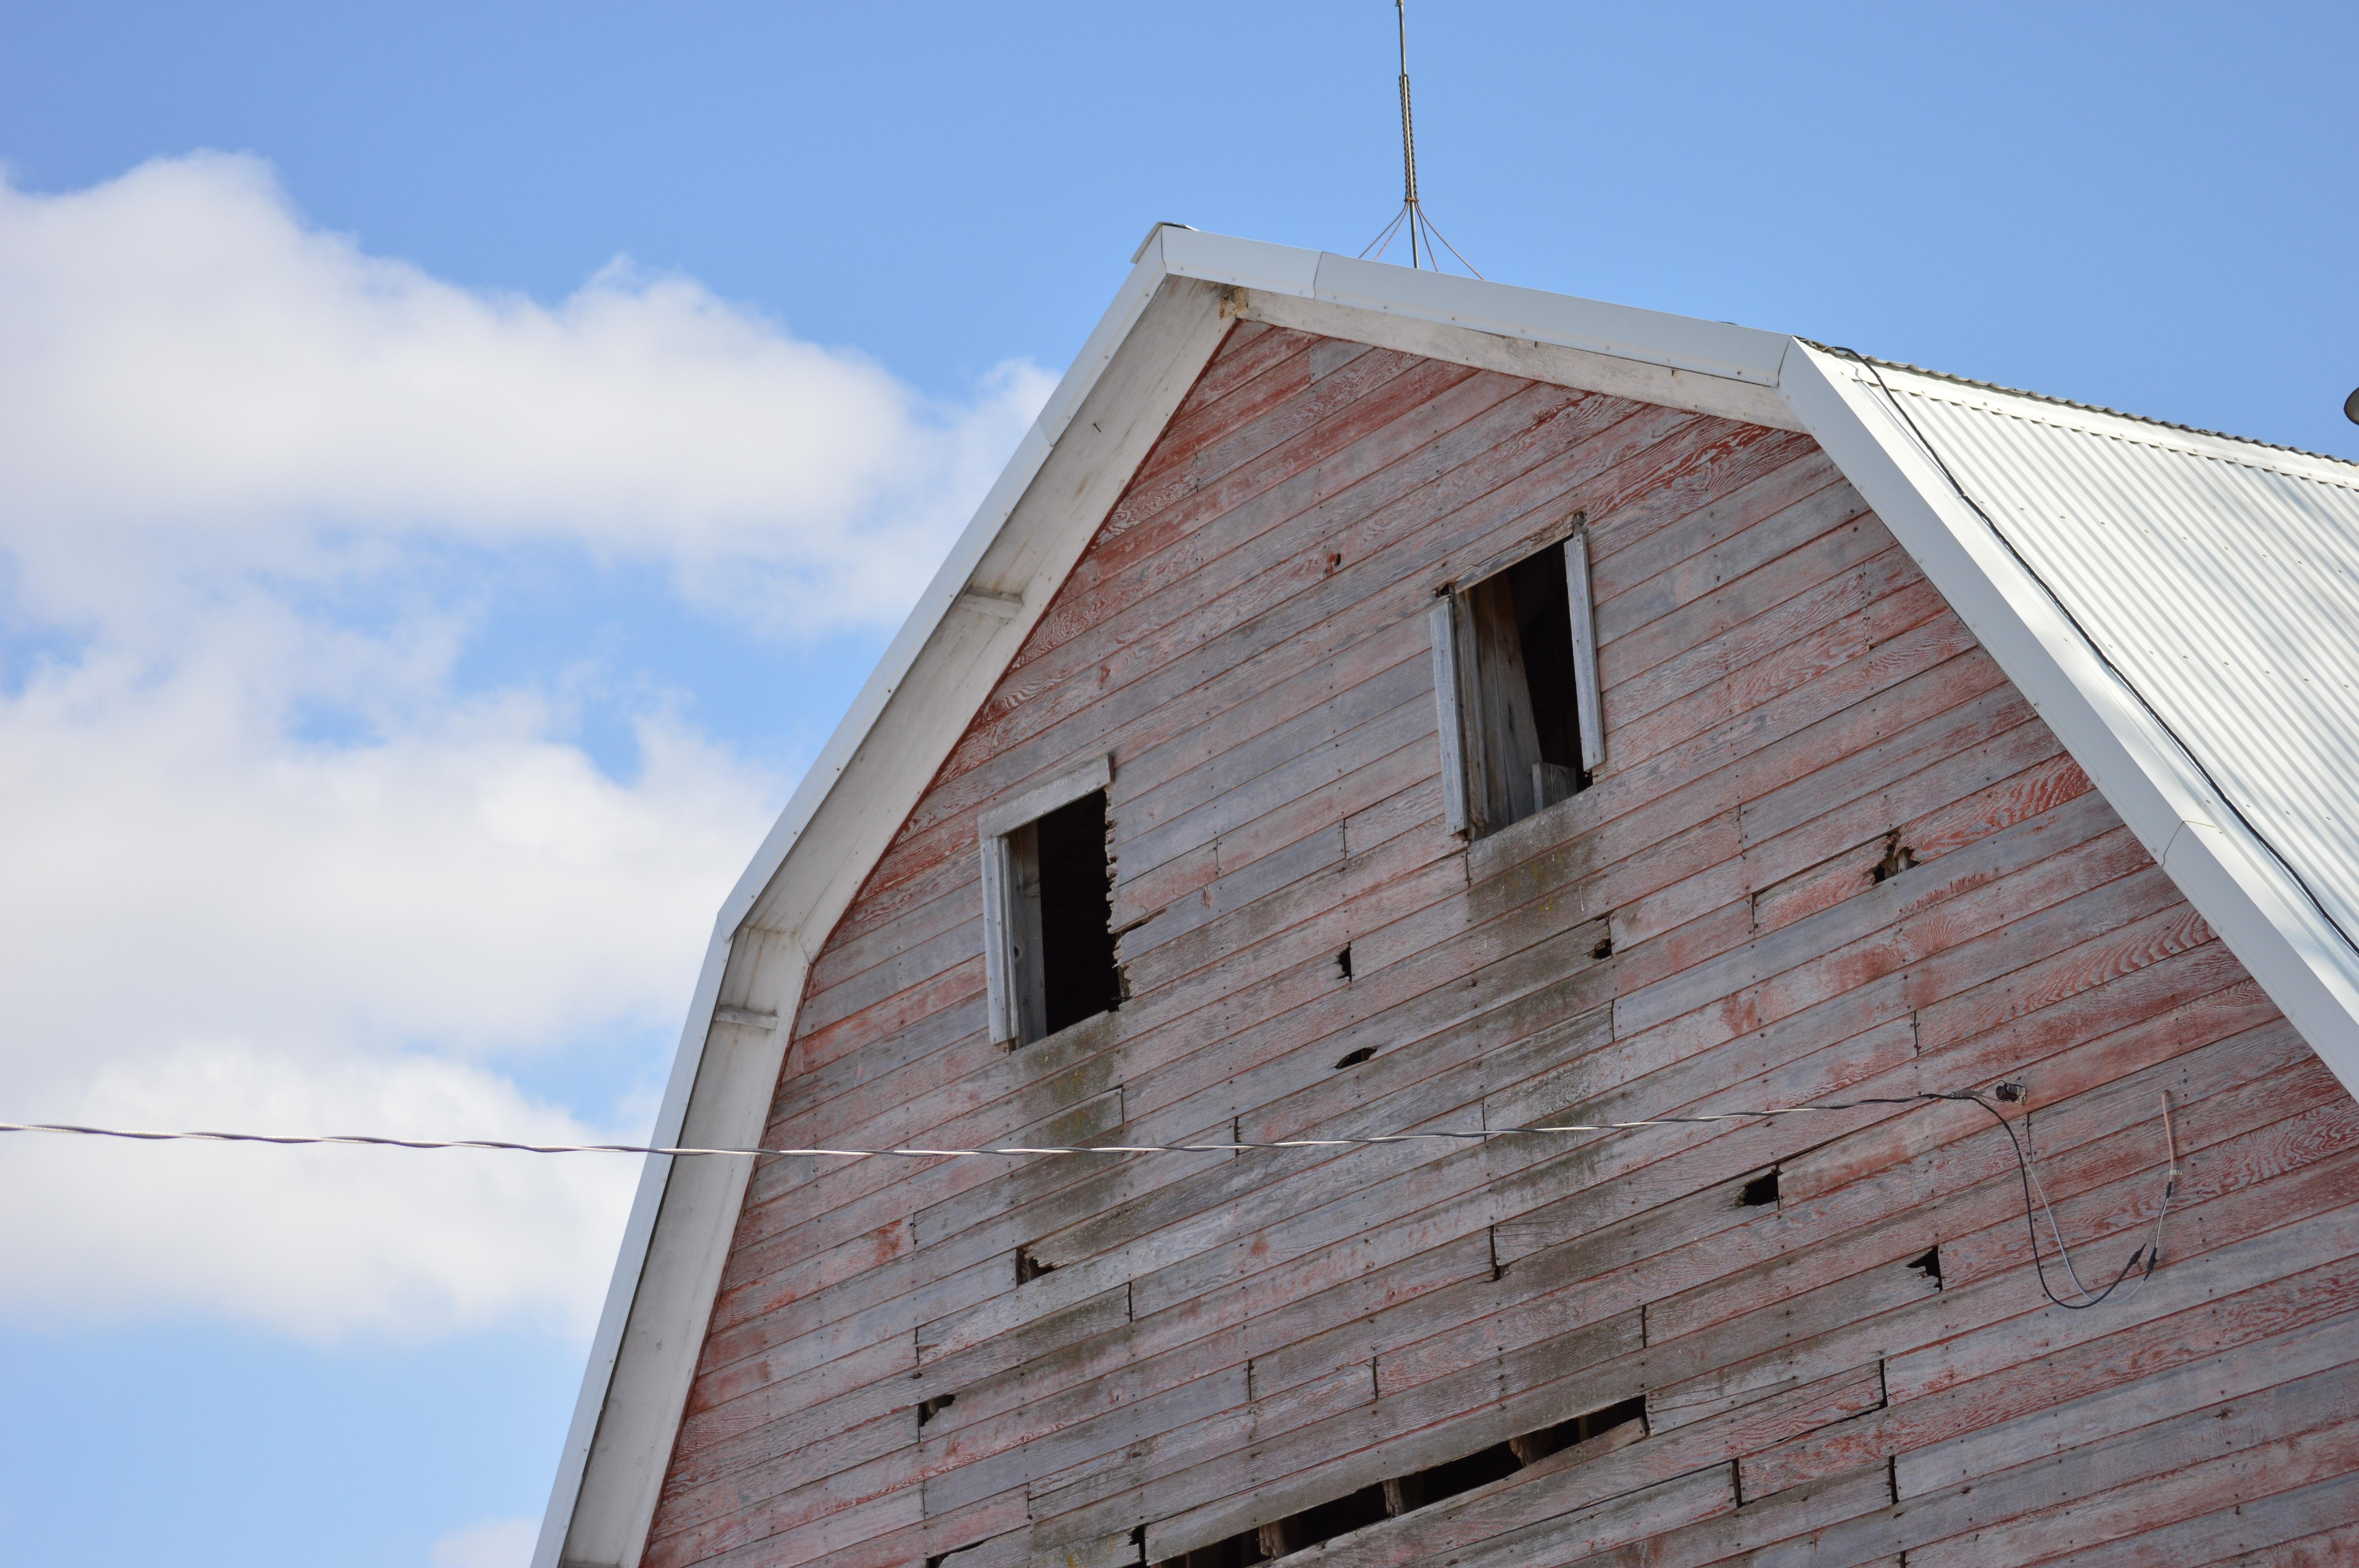 Fotos gratis : arquitectura, cielo, granja, vendimia, casa, textura ...